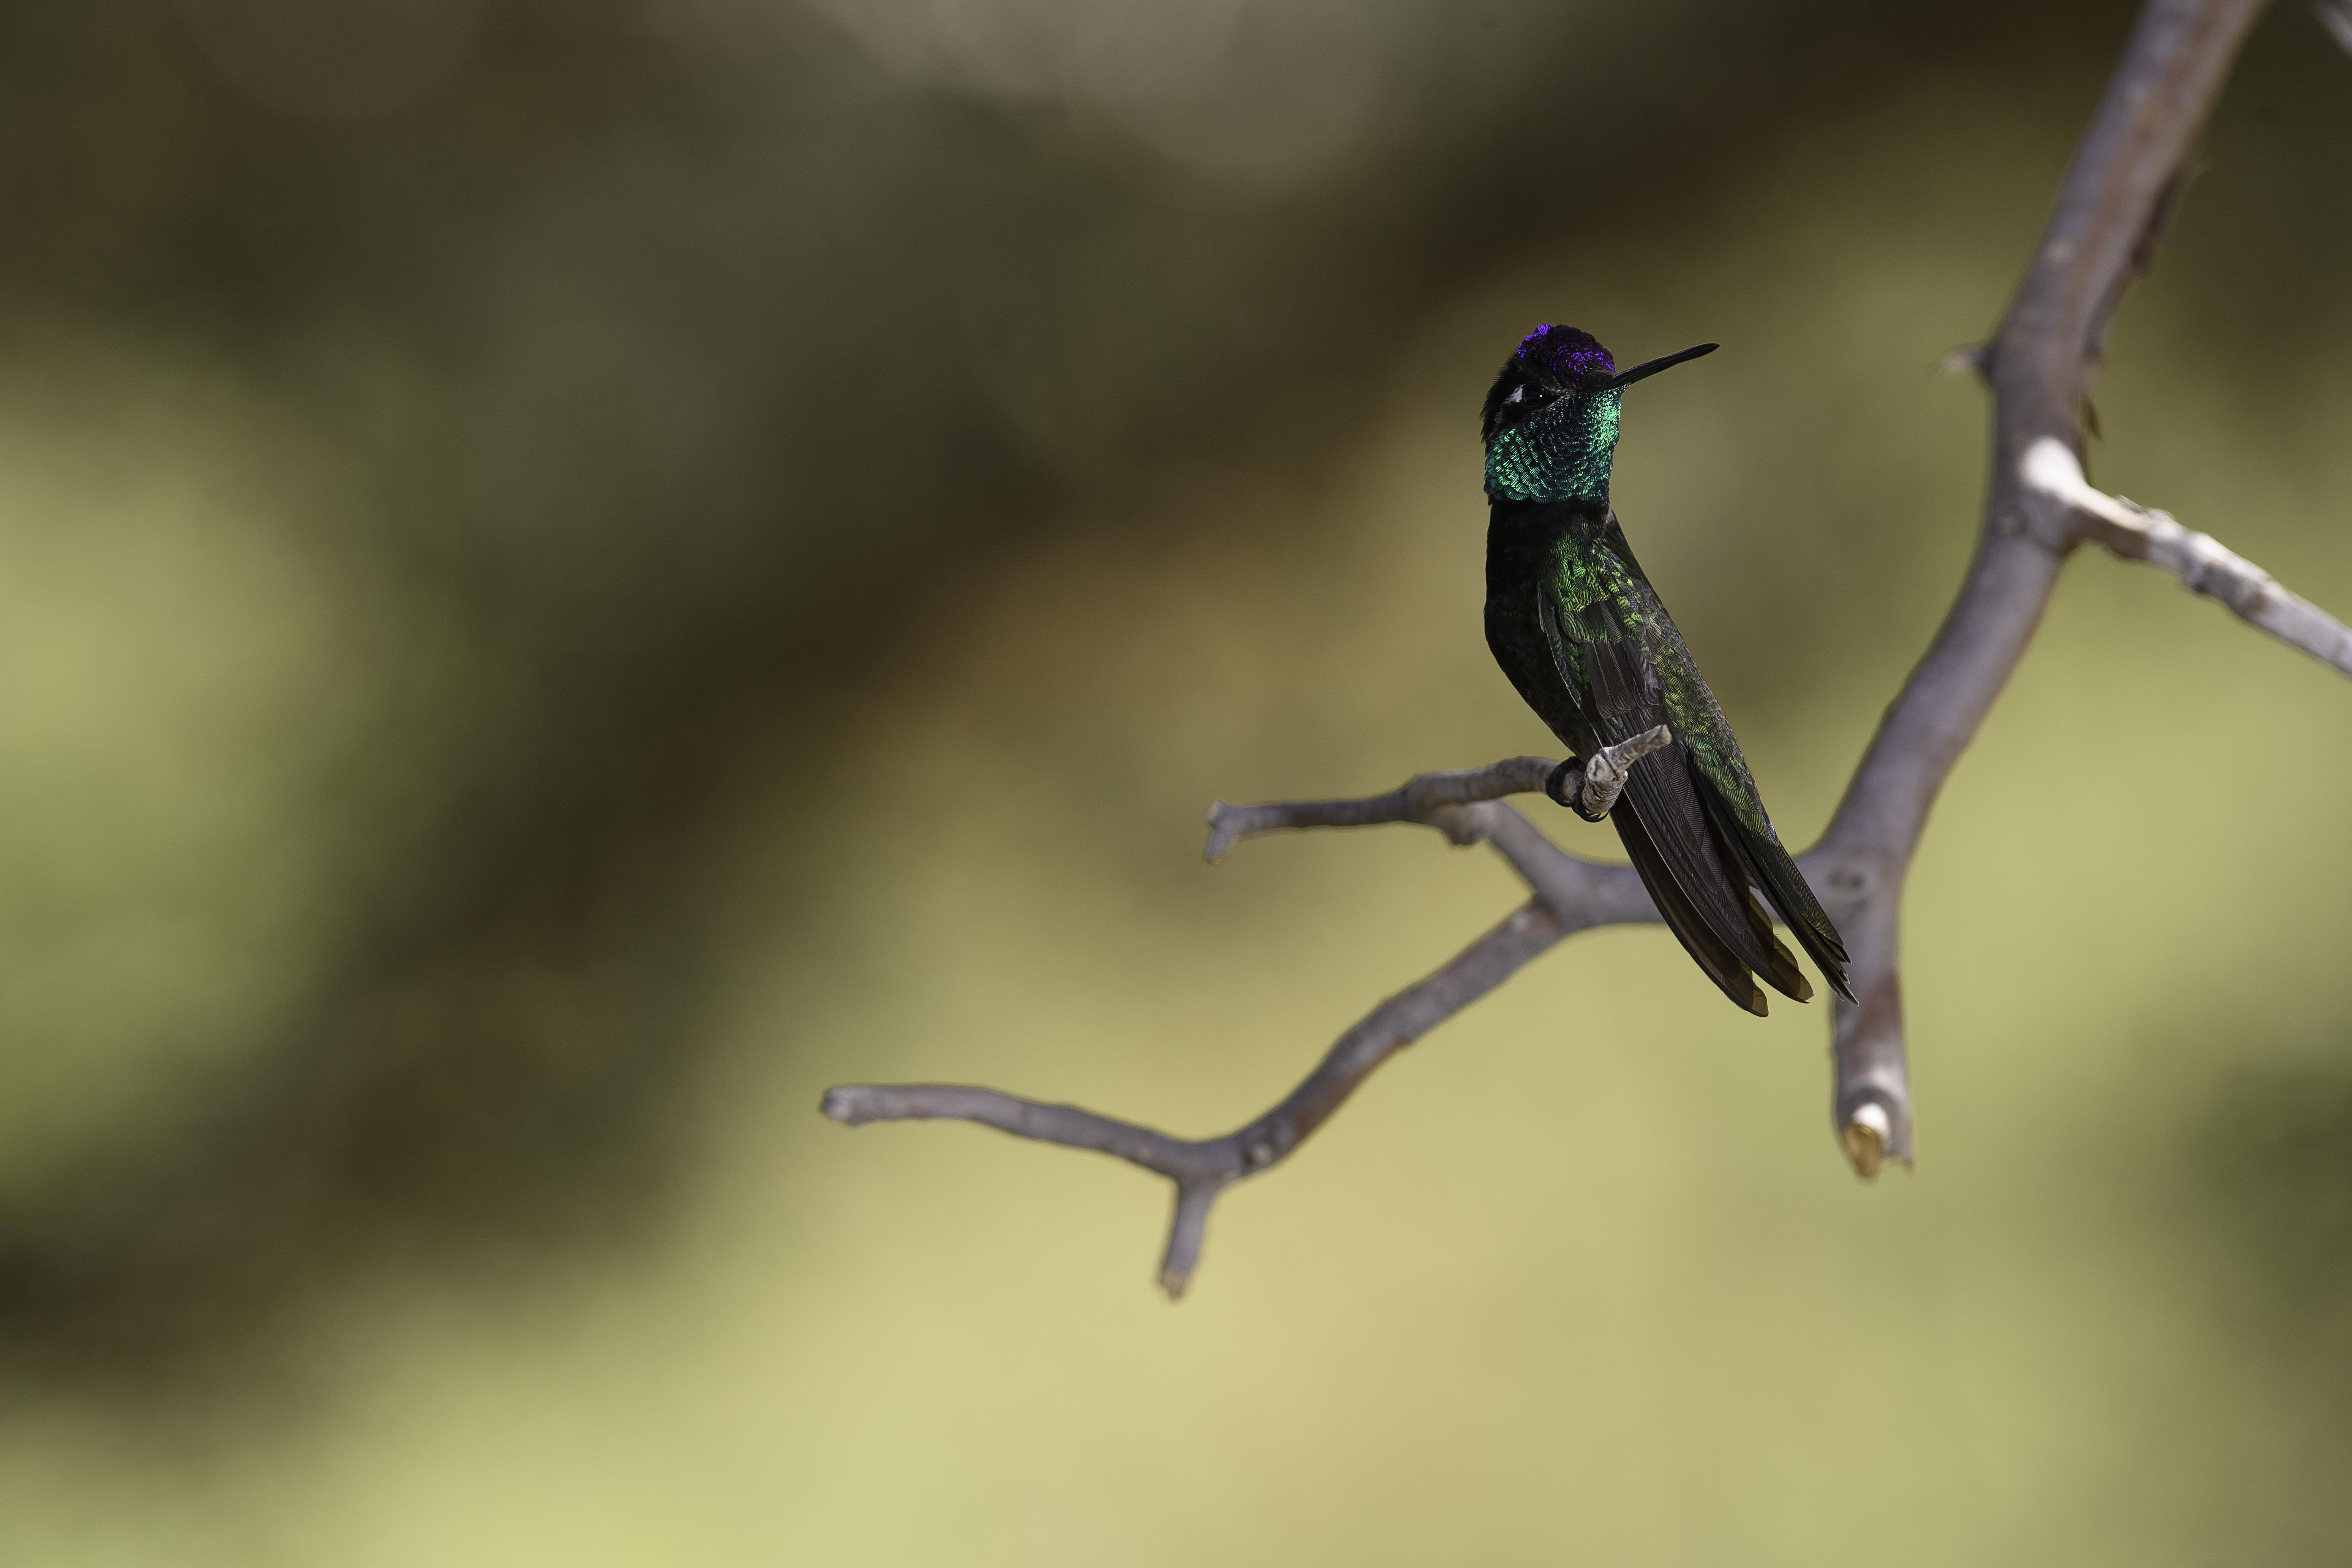 Mr. Wonderful perched